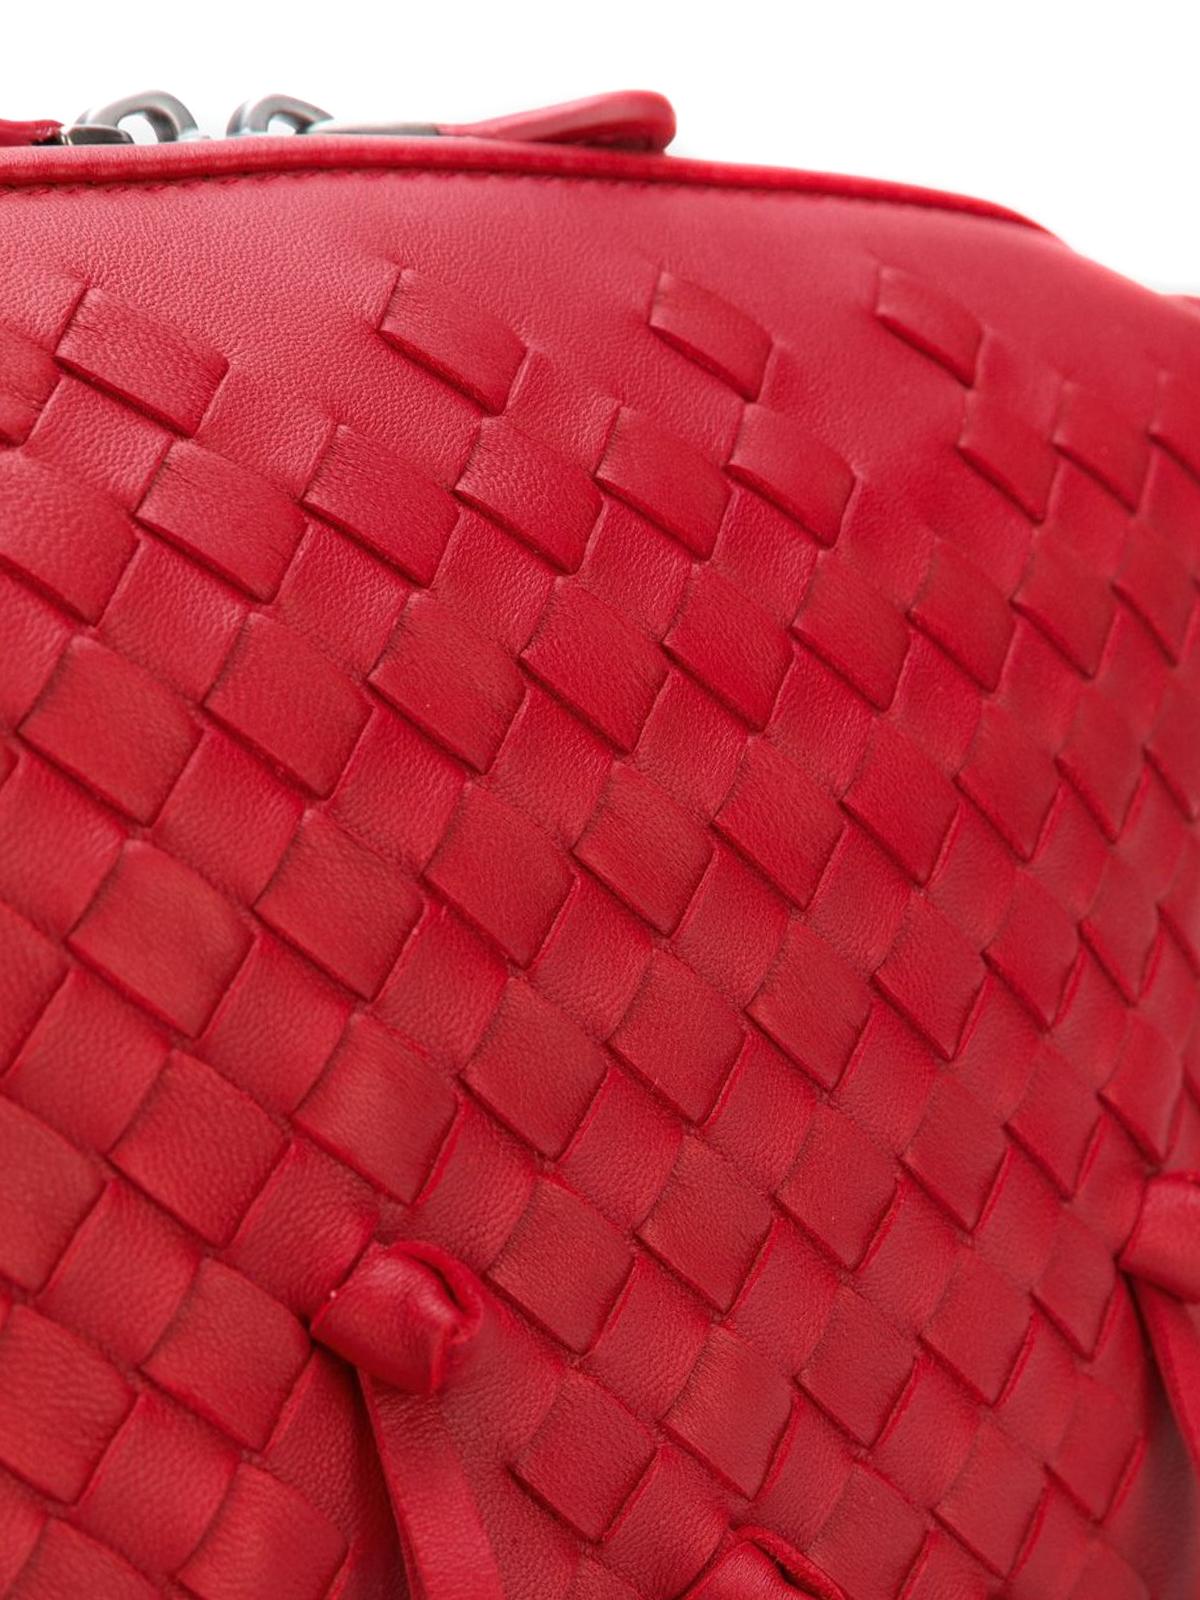 f6bc98bdf5 ... Nodini China Red Intrecciato Nodini bag shop online  BOTTEGA VENETA ...